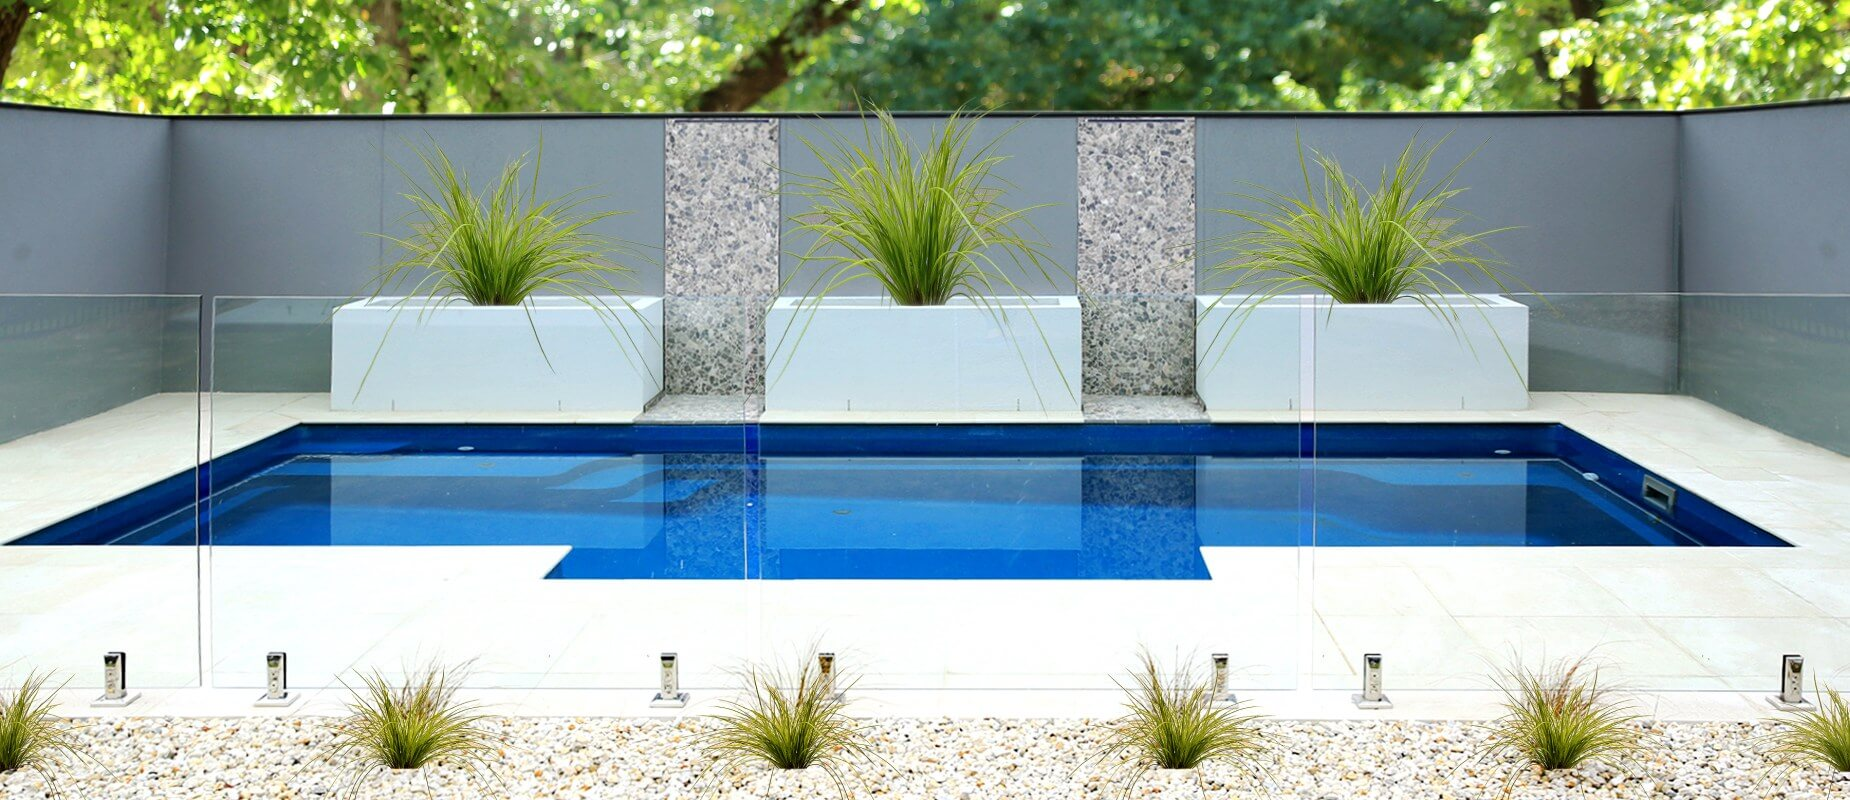 piscina de lux modele frumoase 51